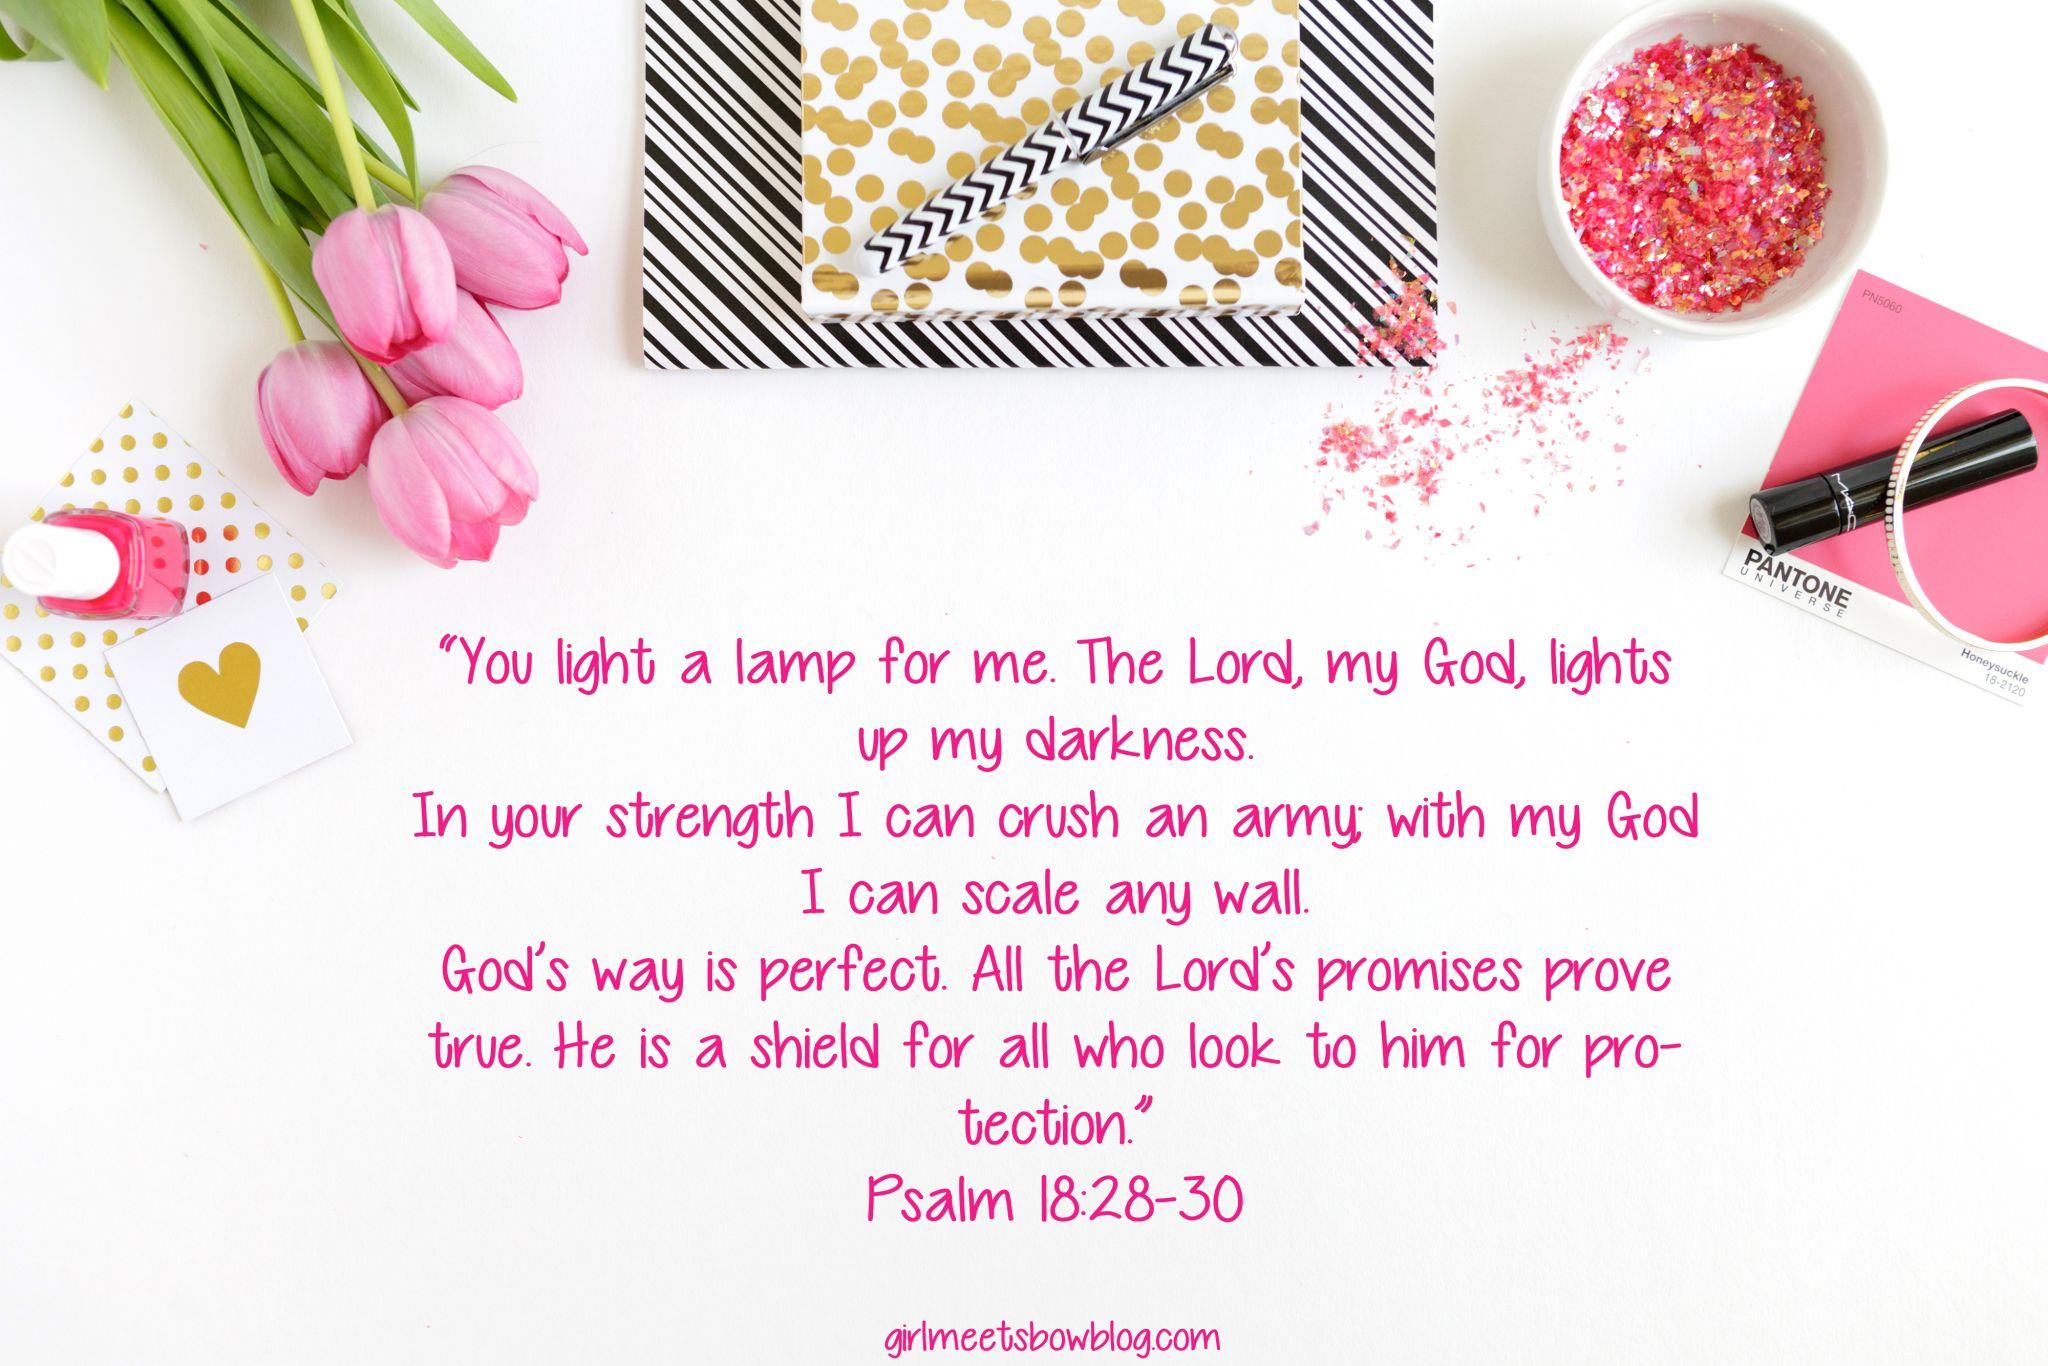 Psalm 18:28-30